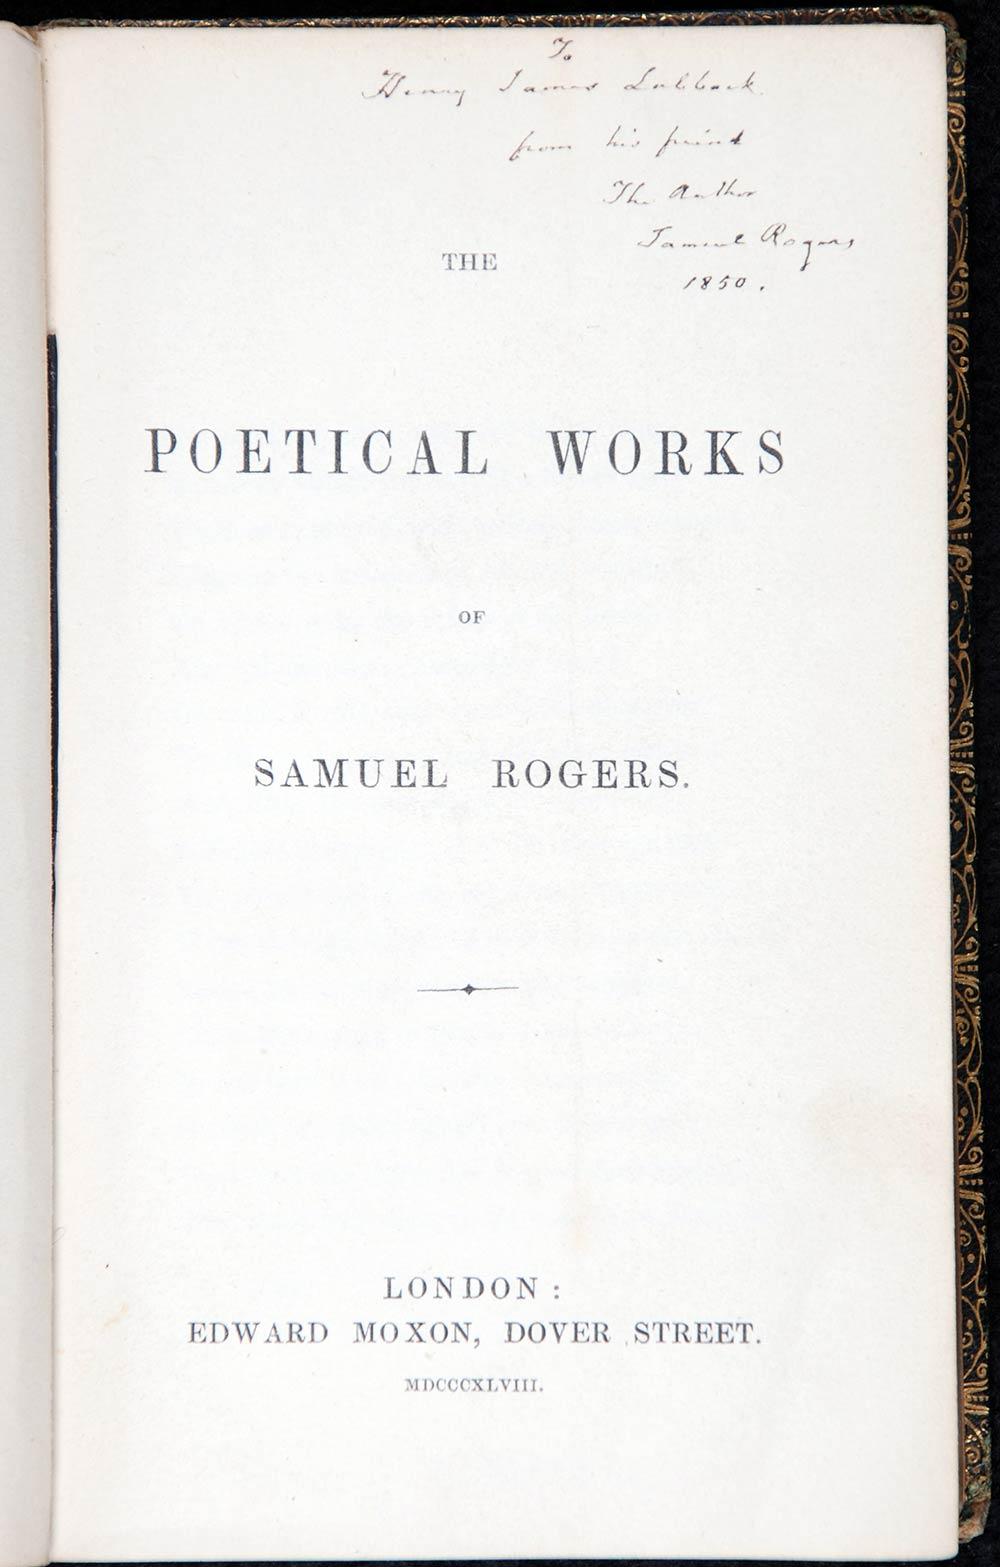 Samuel Rogers. <em>The poetical works of Samuel Rogers</em>. London: Edward Moxon, 1848.